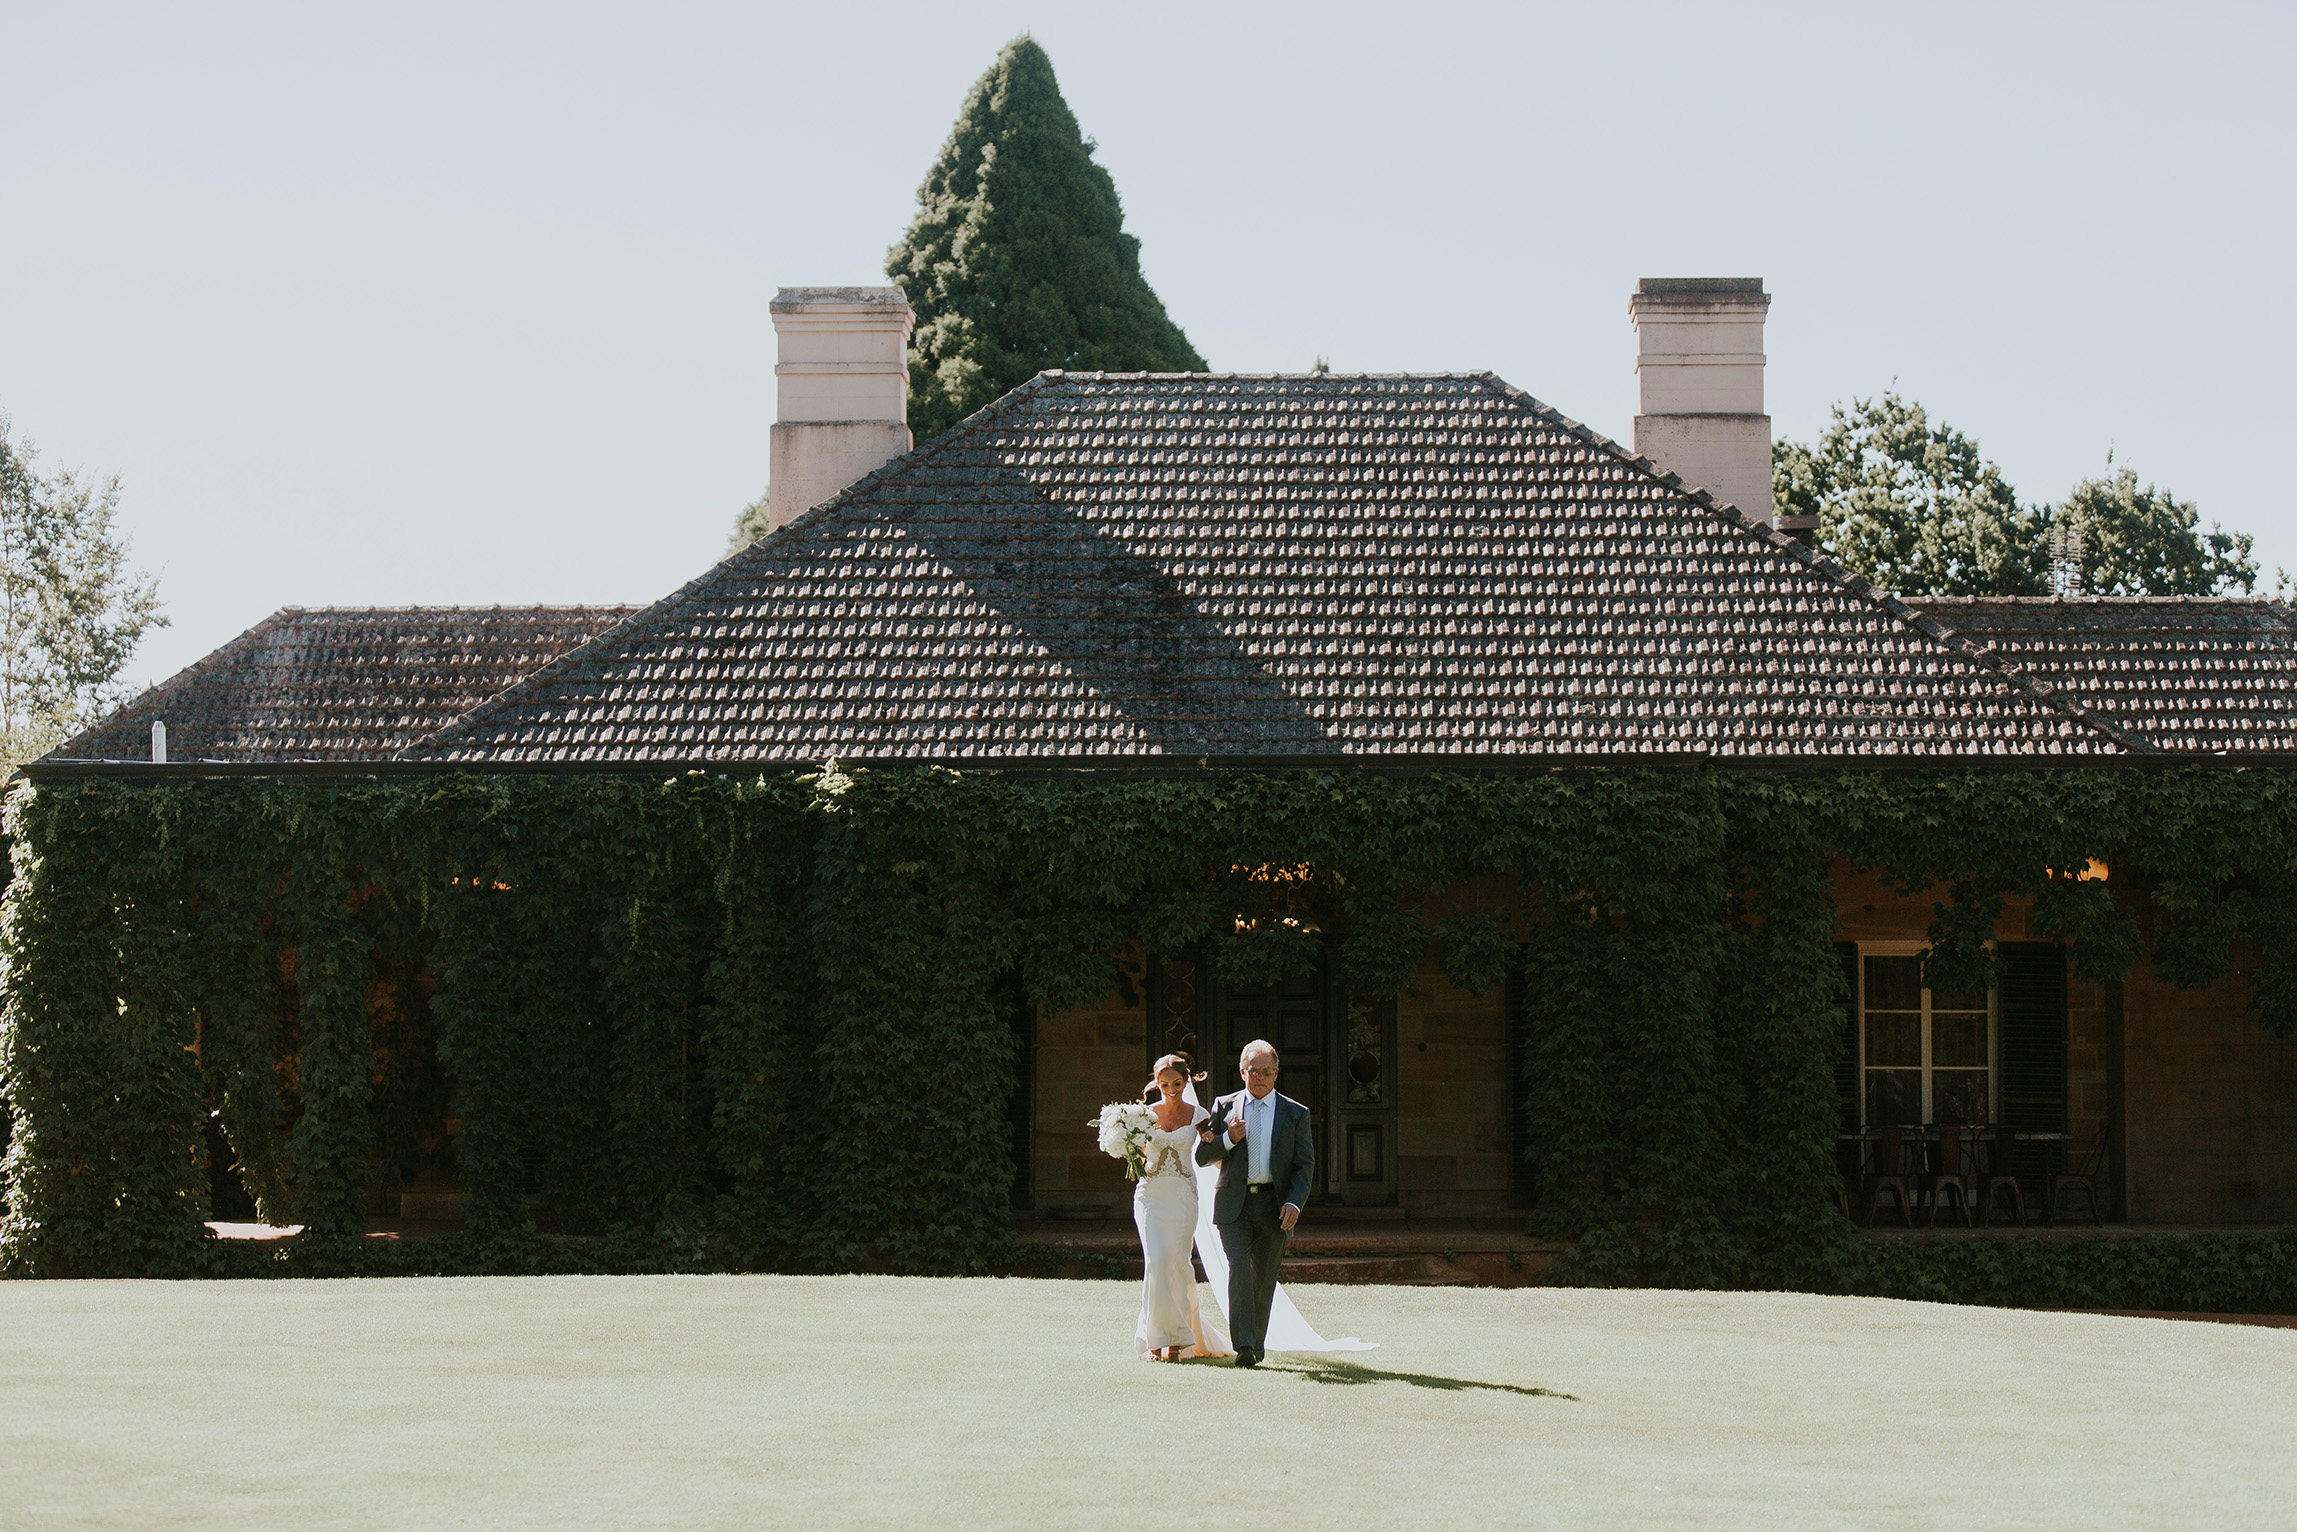 keli-luke-maybury-wedding-143_1.jpg